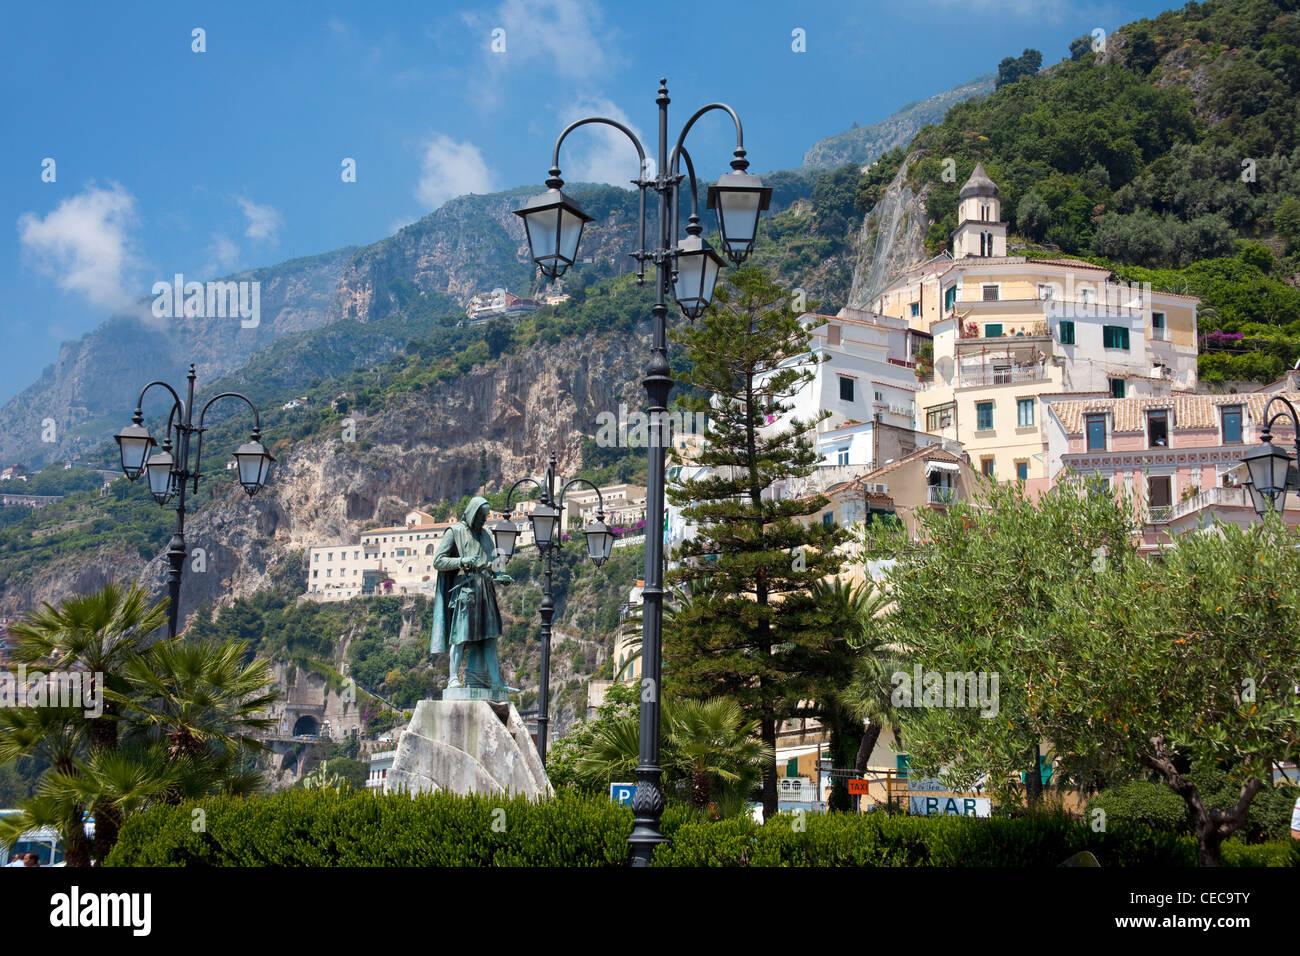 Memorial to Flavio Gioia, inventor of compass, village Amalfi, Amalfi coast, Unesco World Heritage site, Campania, - Stock Image